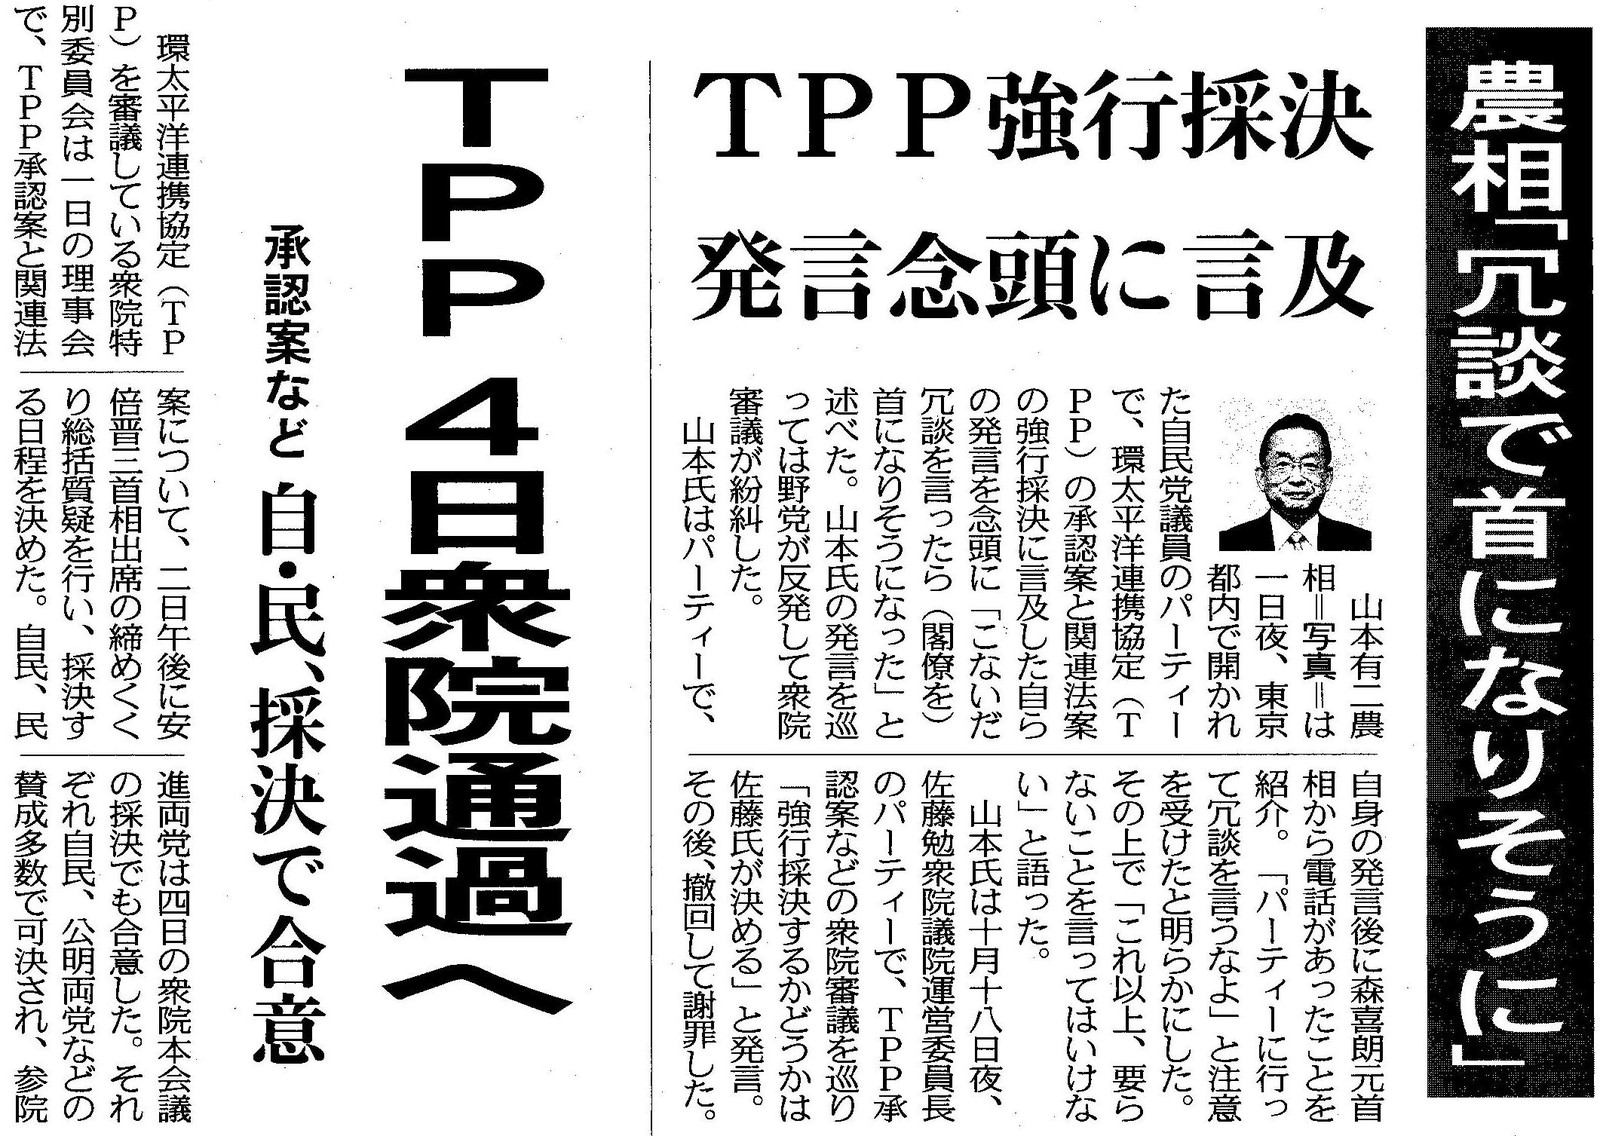 Tpp161102_3